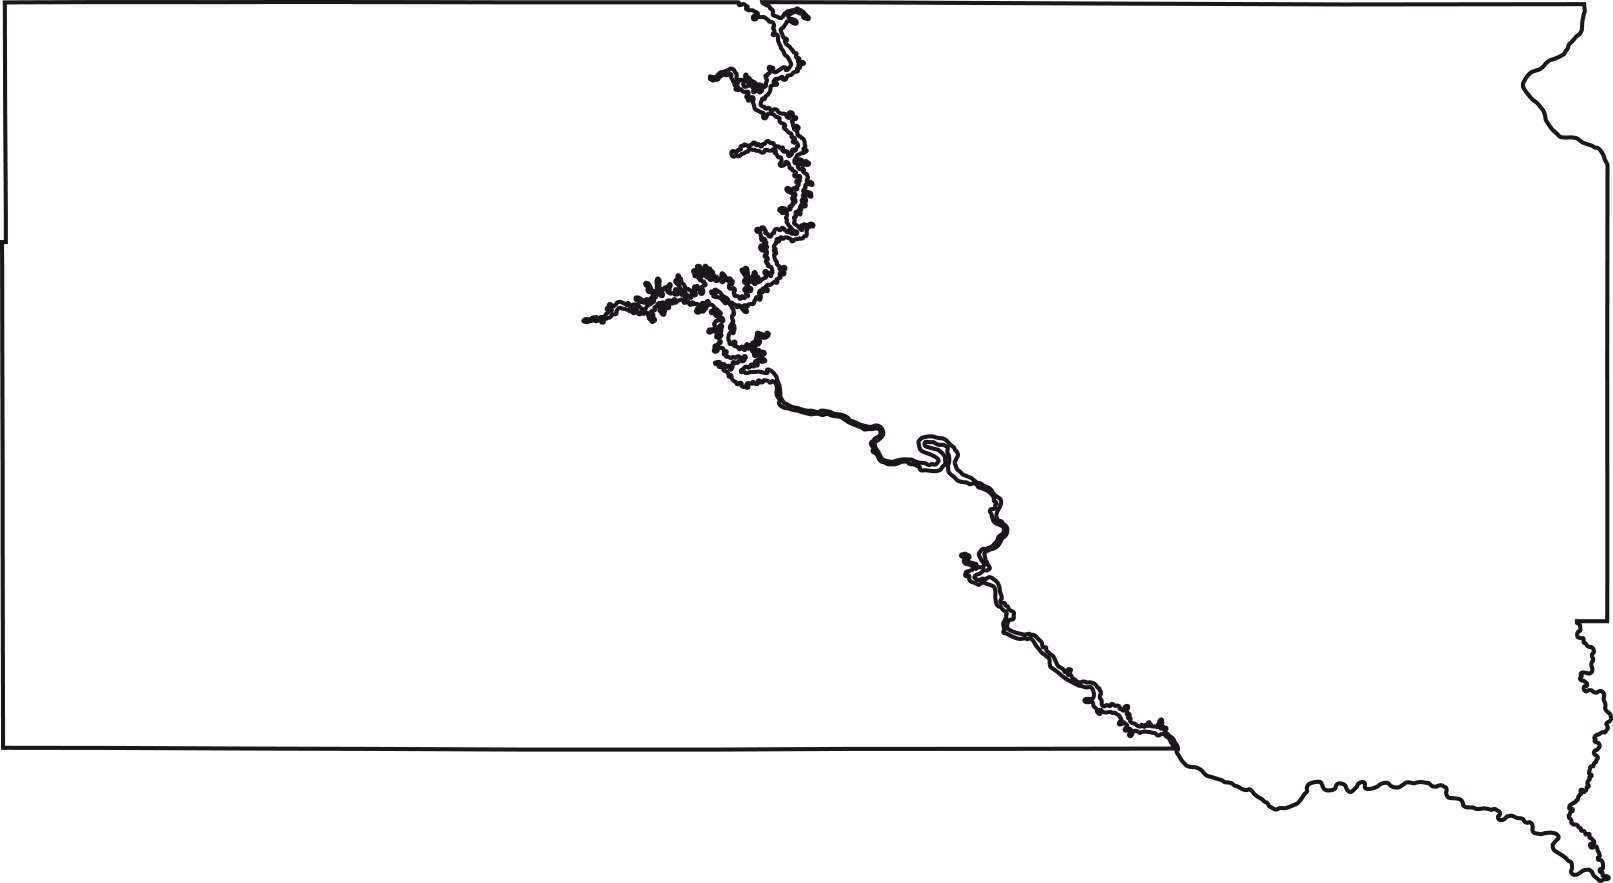 South Dakota Blank Outline Map   Large Printable High Resolution and Standard Map